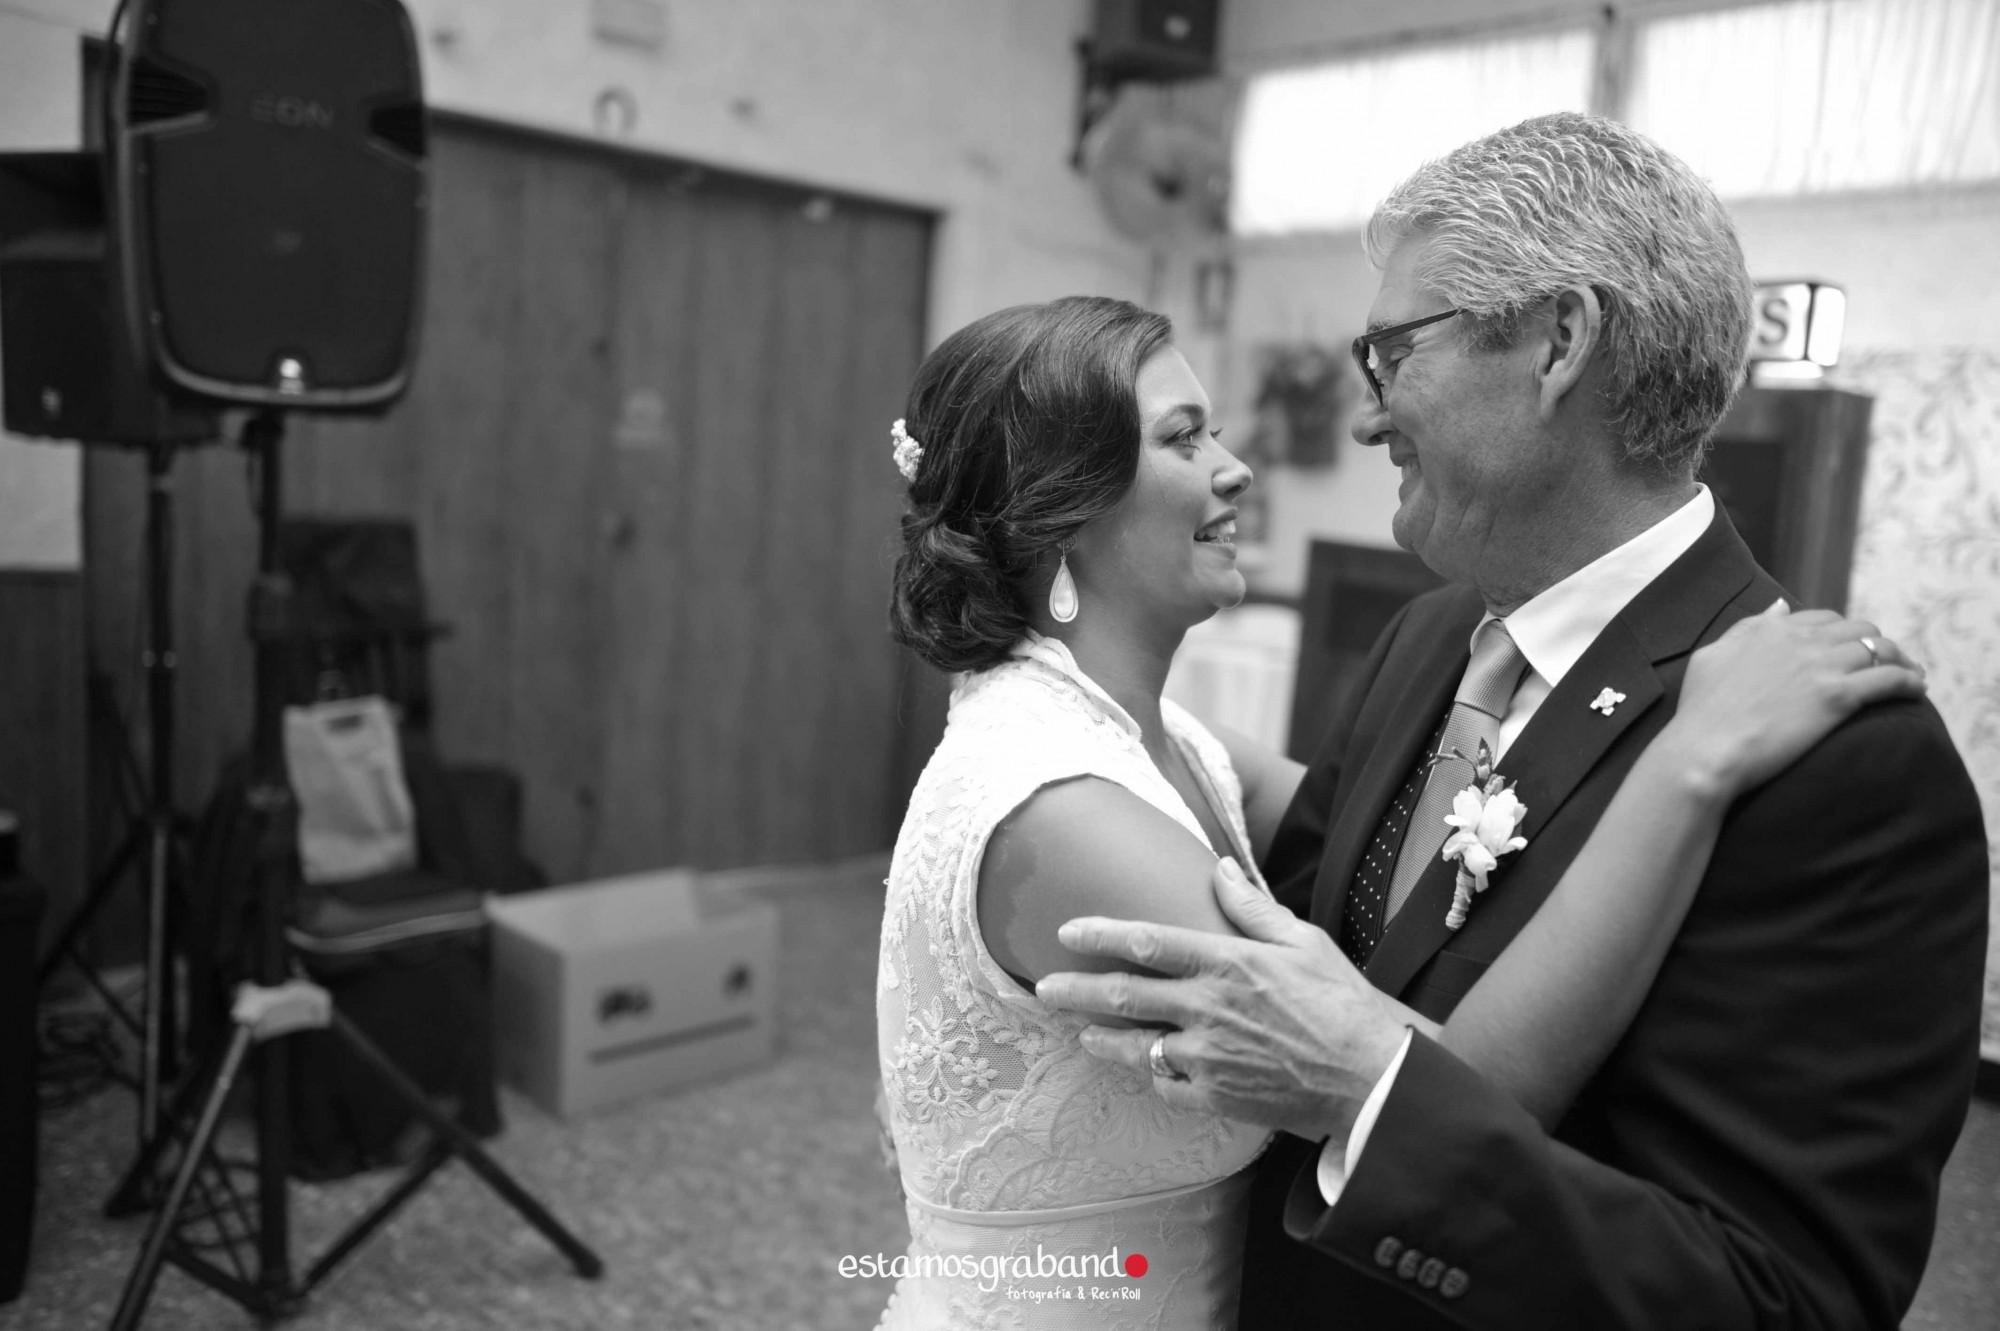 Brenda-y-Geni-128 Brenda & Geni - video boda cadiz